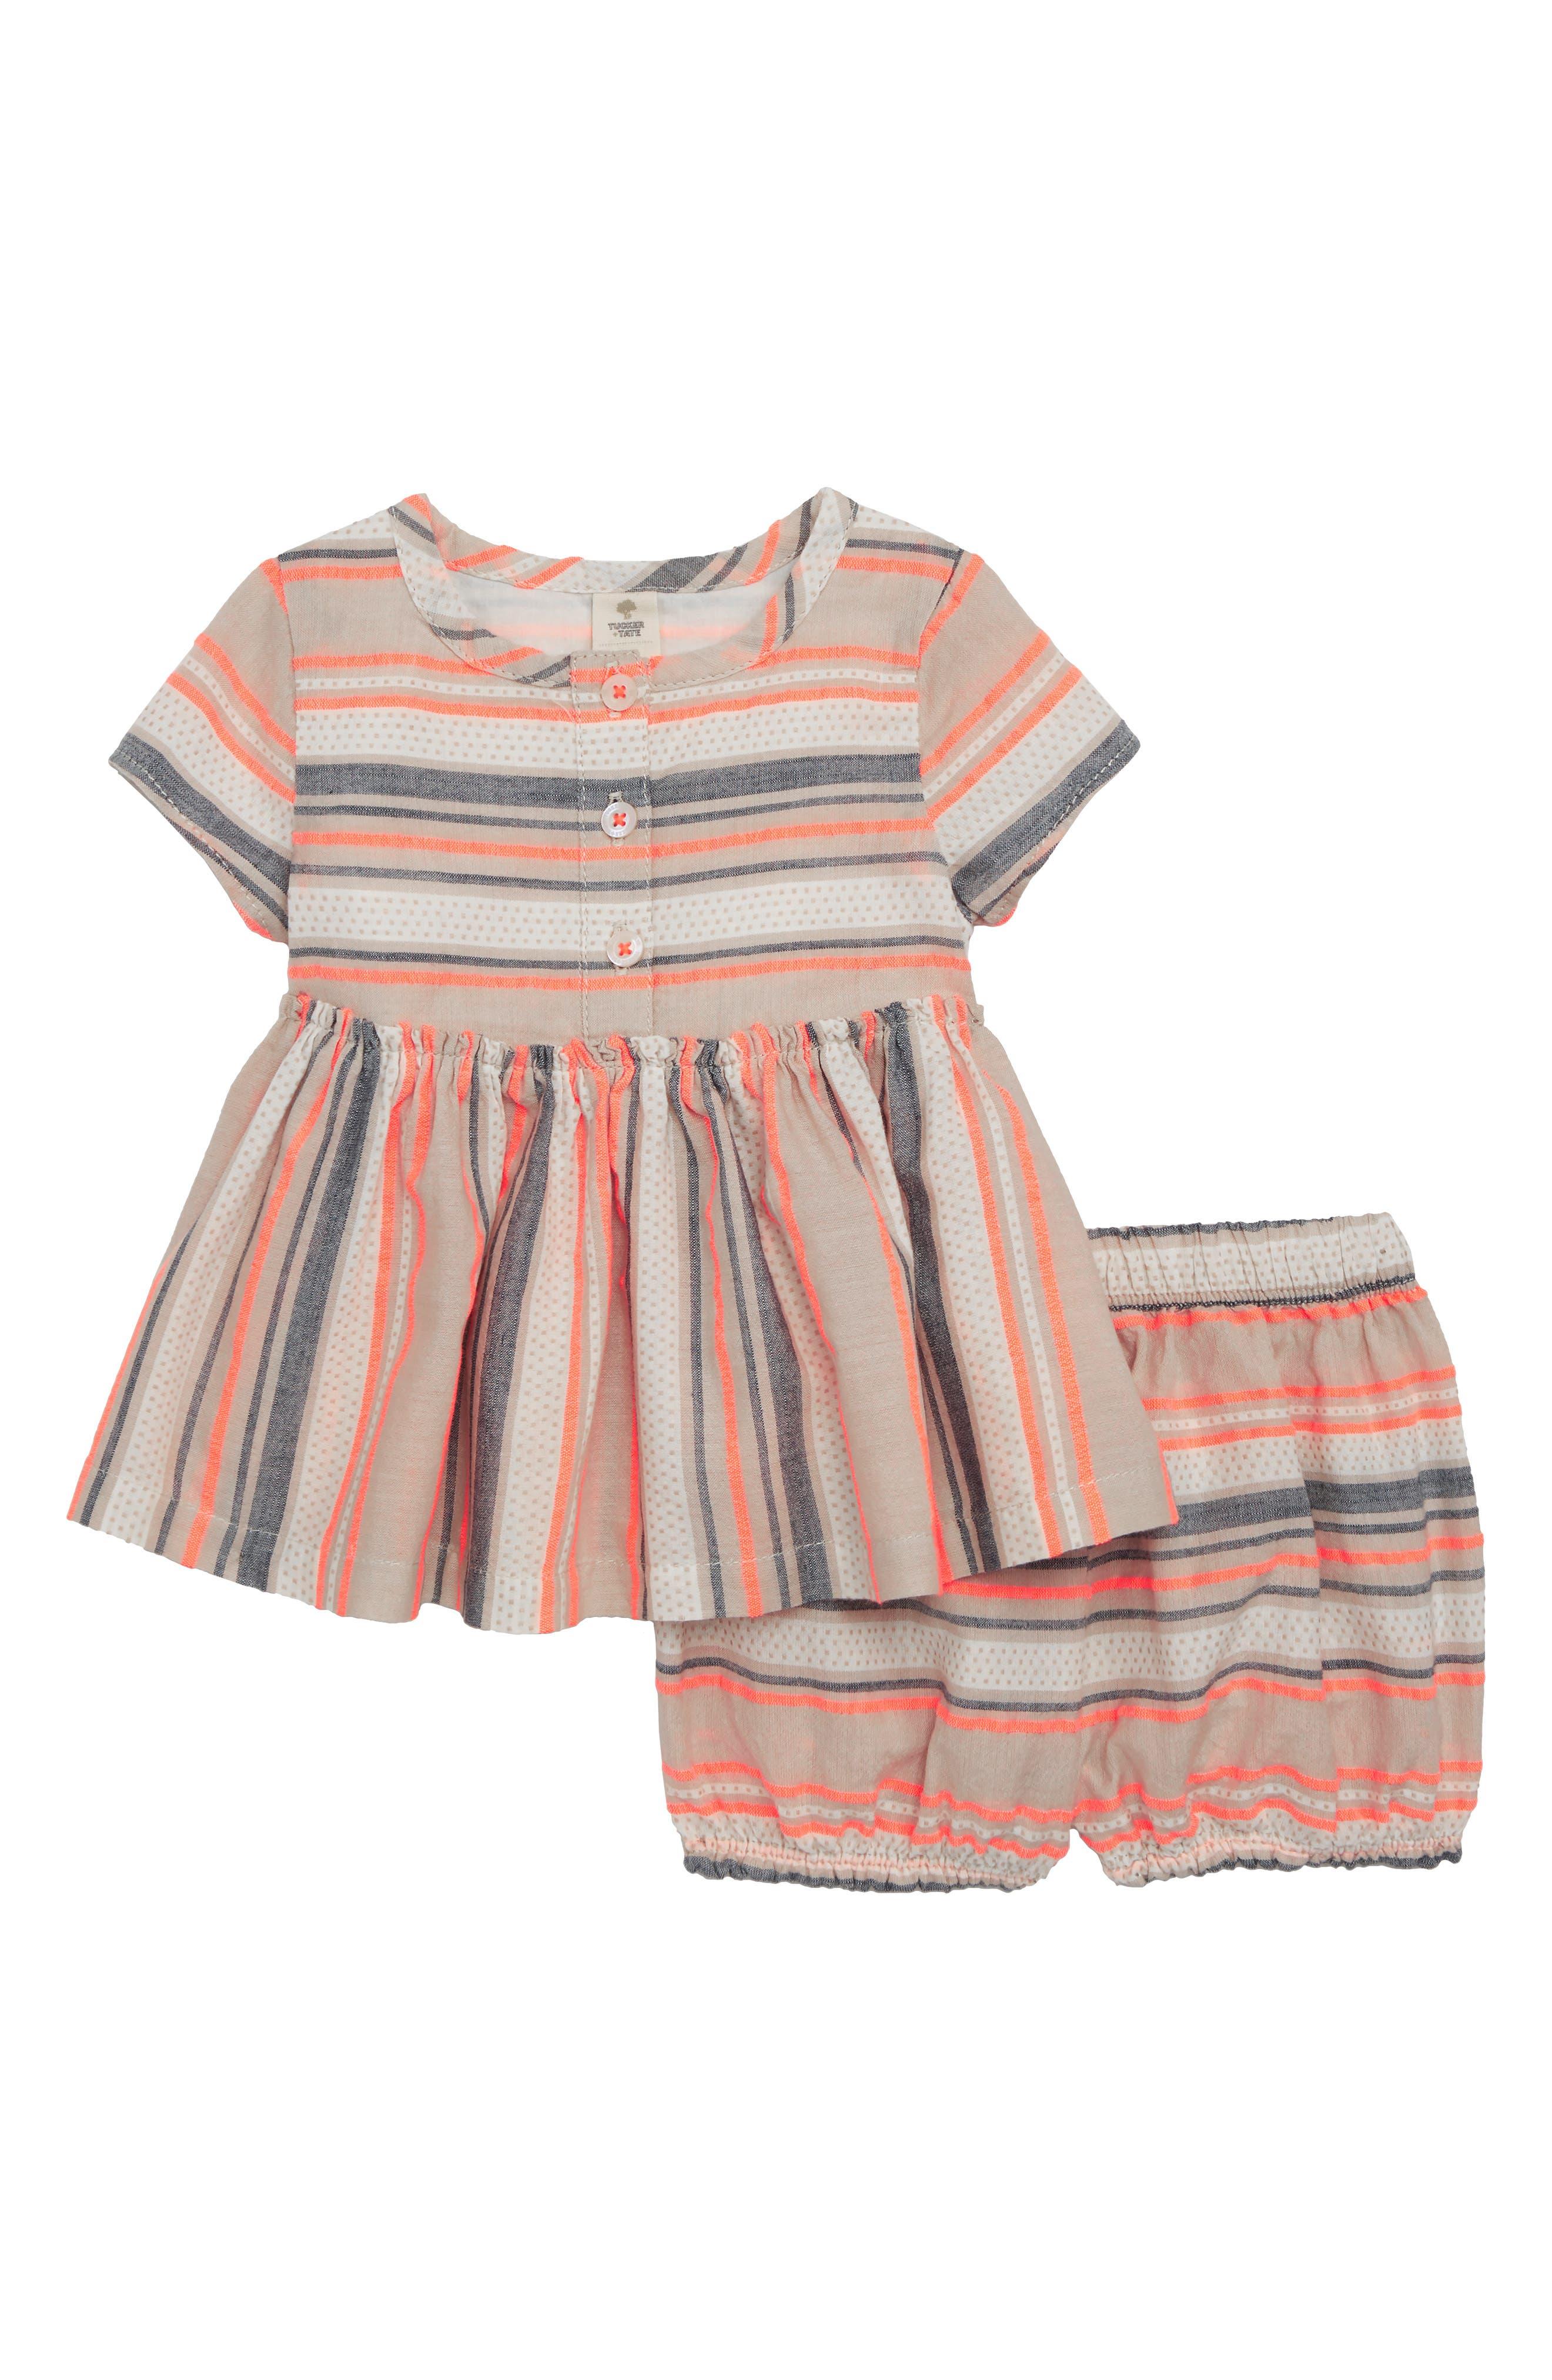 Woven Stripe Swing Top & Bubble Shorts Set,                         Main,                         color, 680